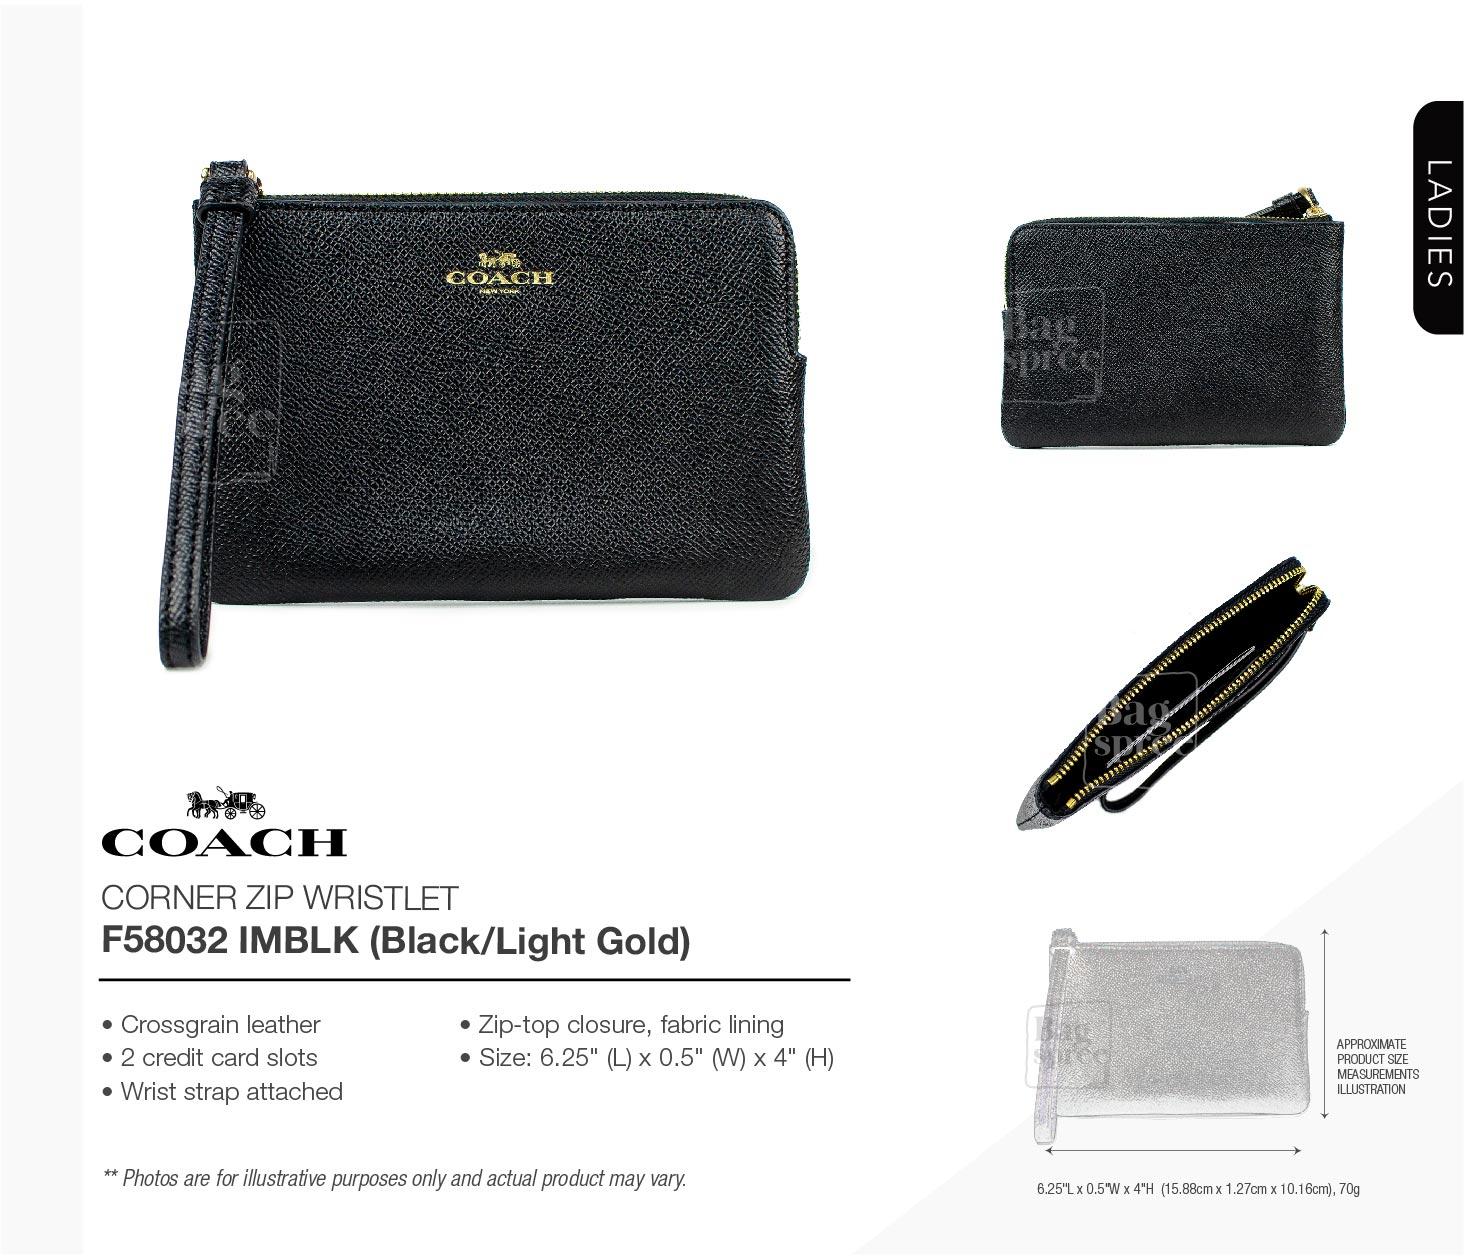 NWT COACH Corner Zip Wristlet Leather Wallet Small Black Gold Phone F58032 IMBLK